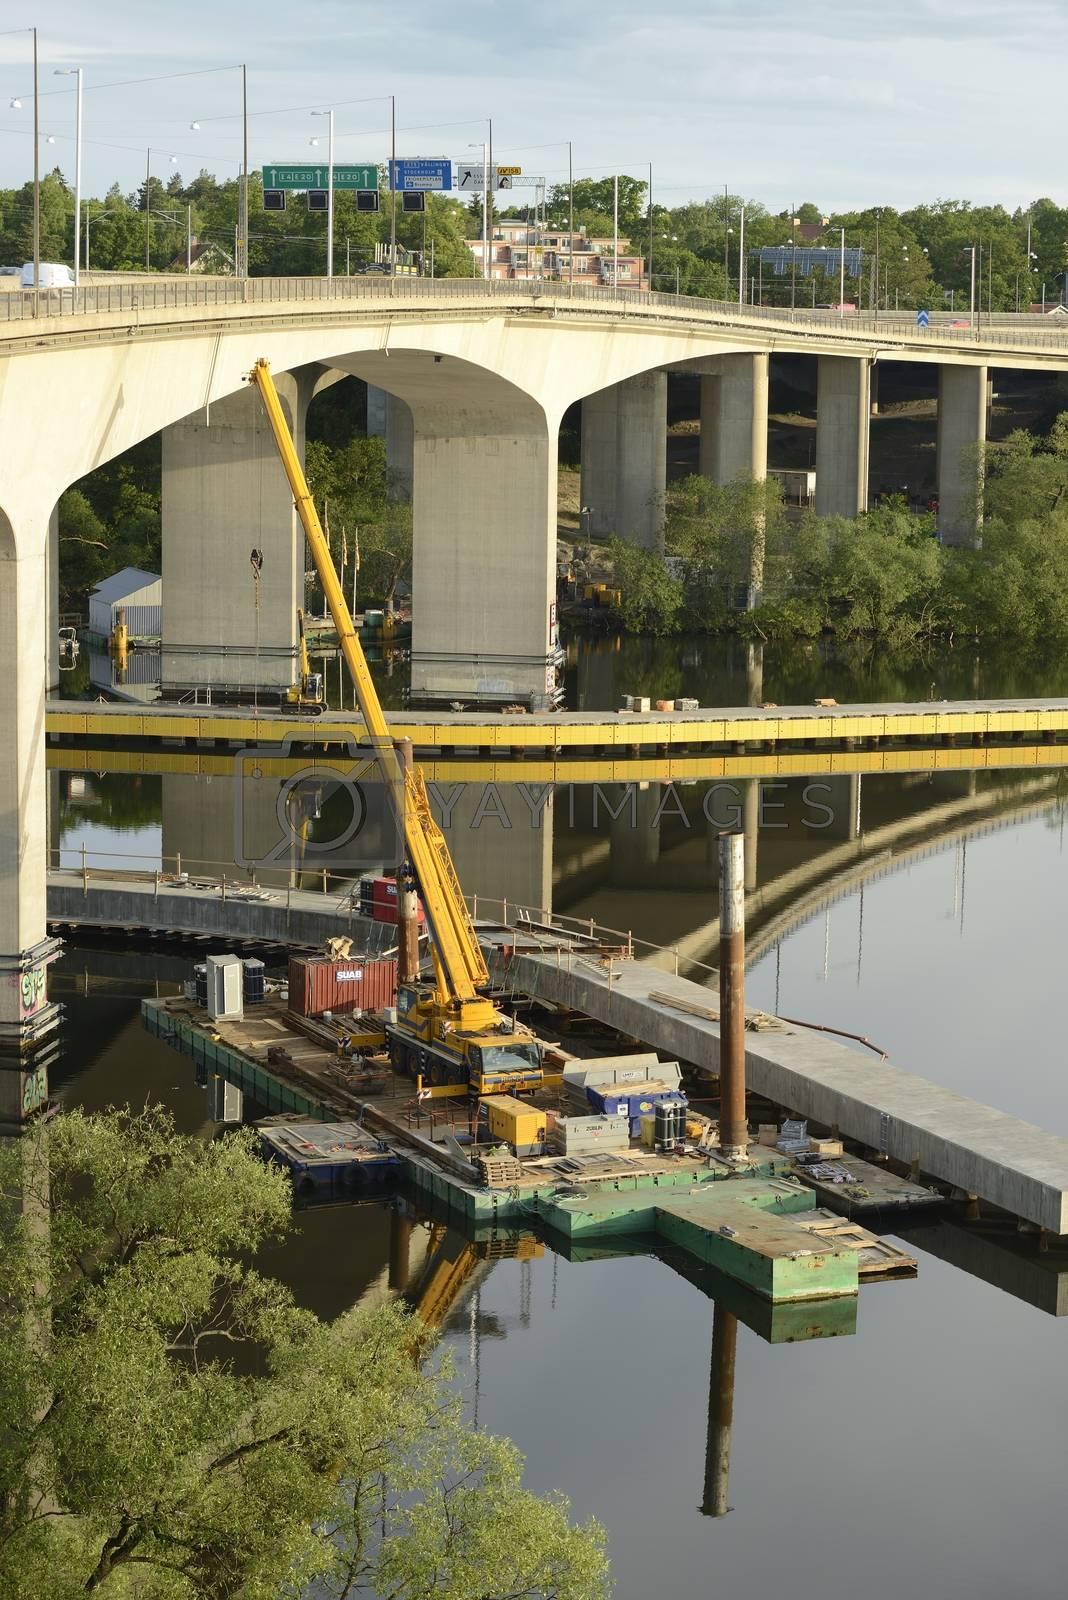 Fragment view of the bridge under reconstruction.